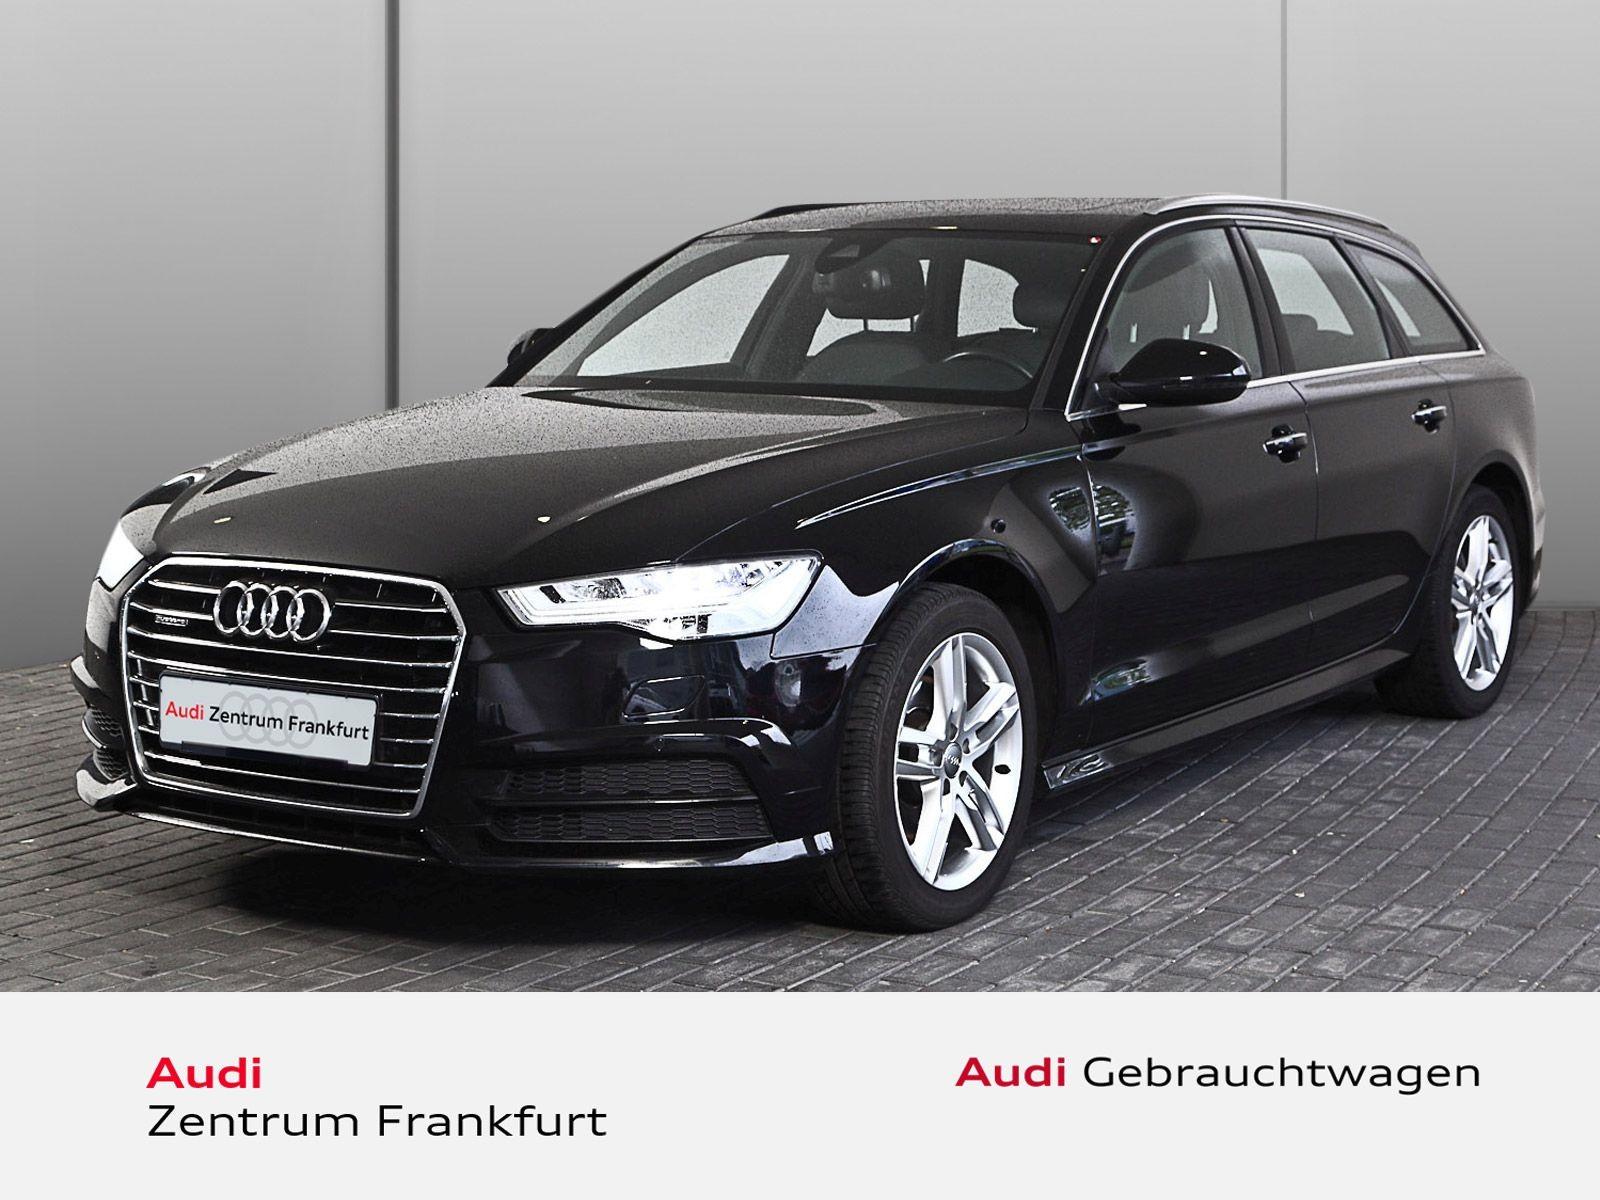 Audi A6 Avant 2.0 TDI quattro S tronic LED StdHz Pano Navi PDC Tempomat, Jahr 2018, Diesel